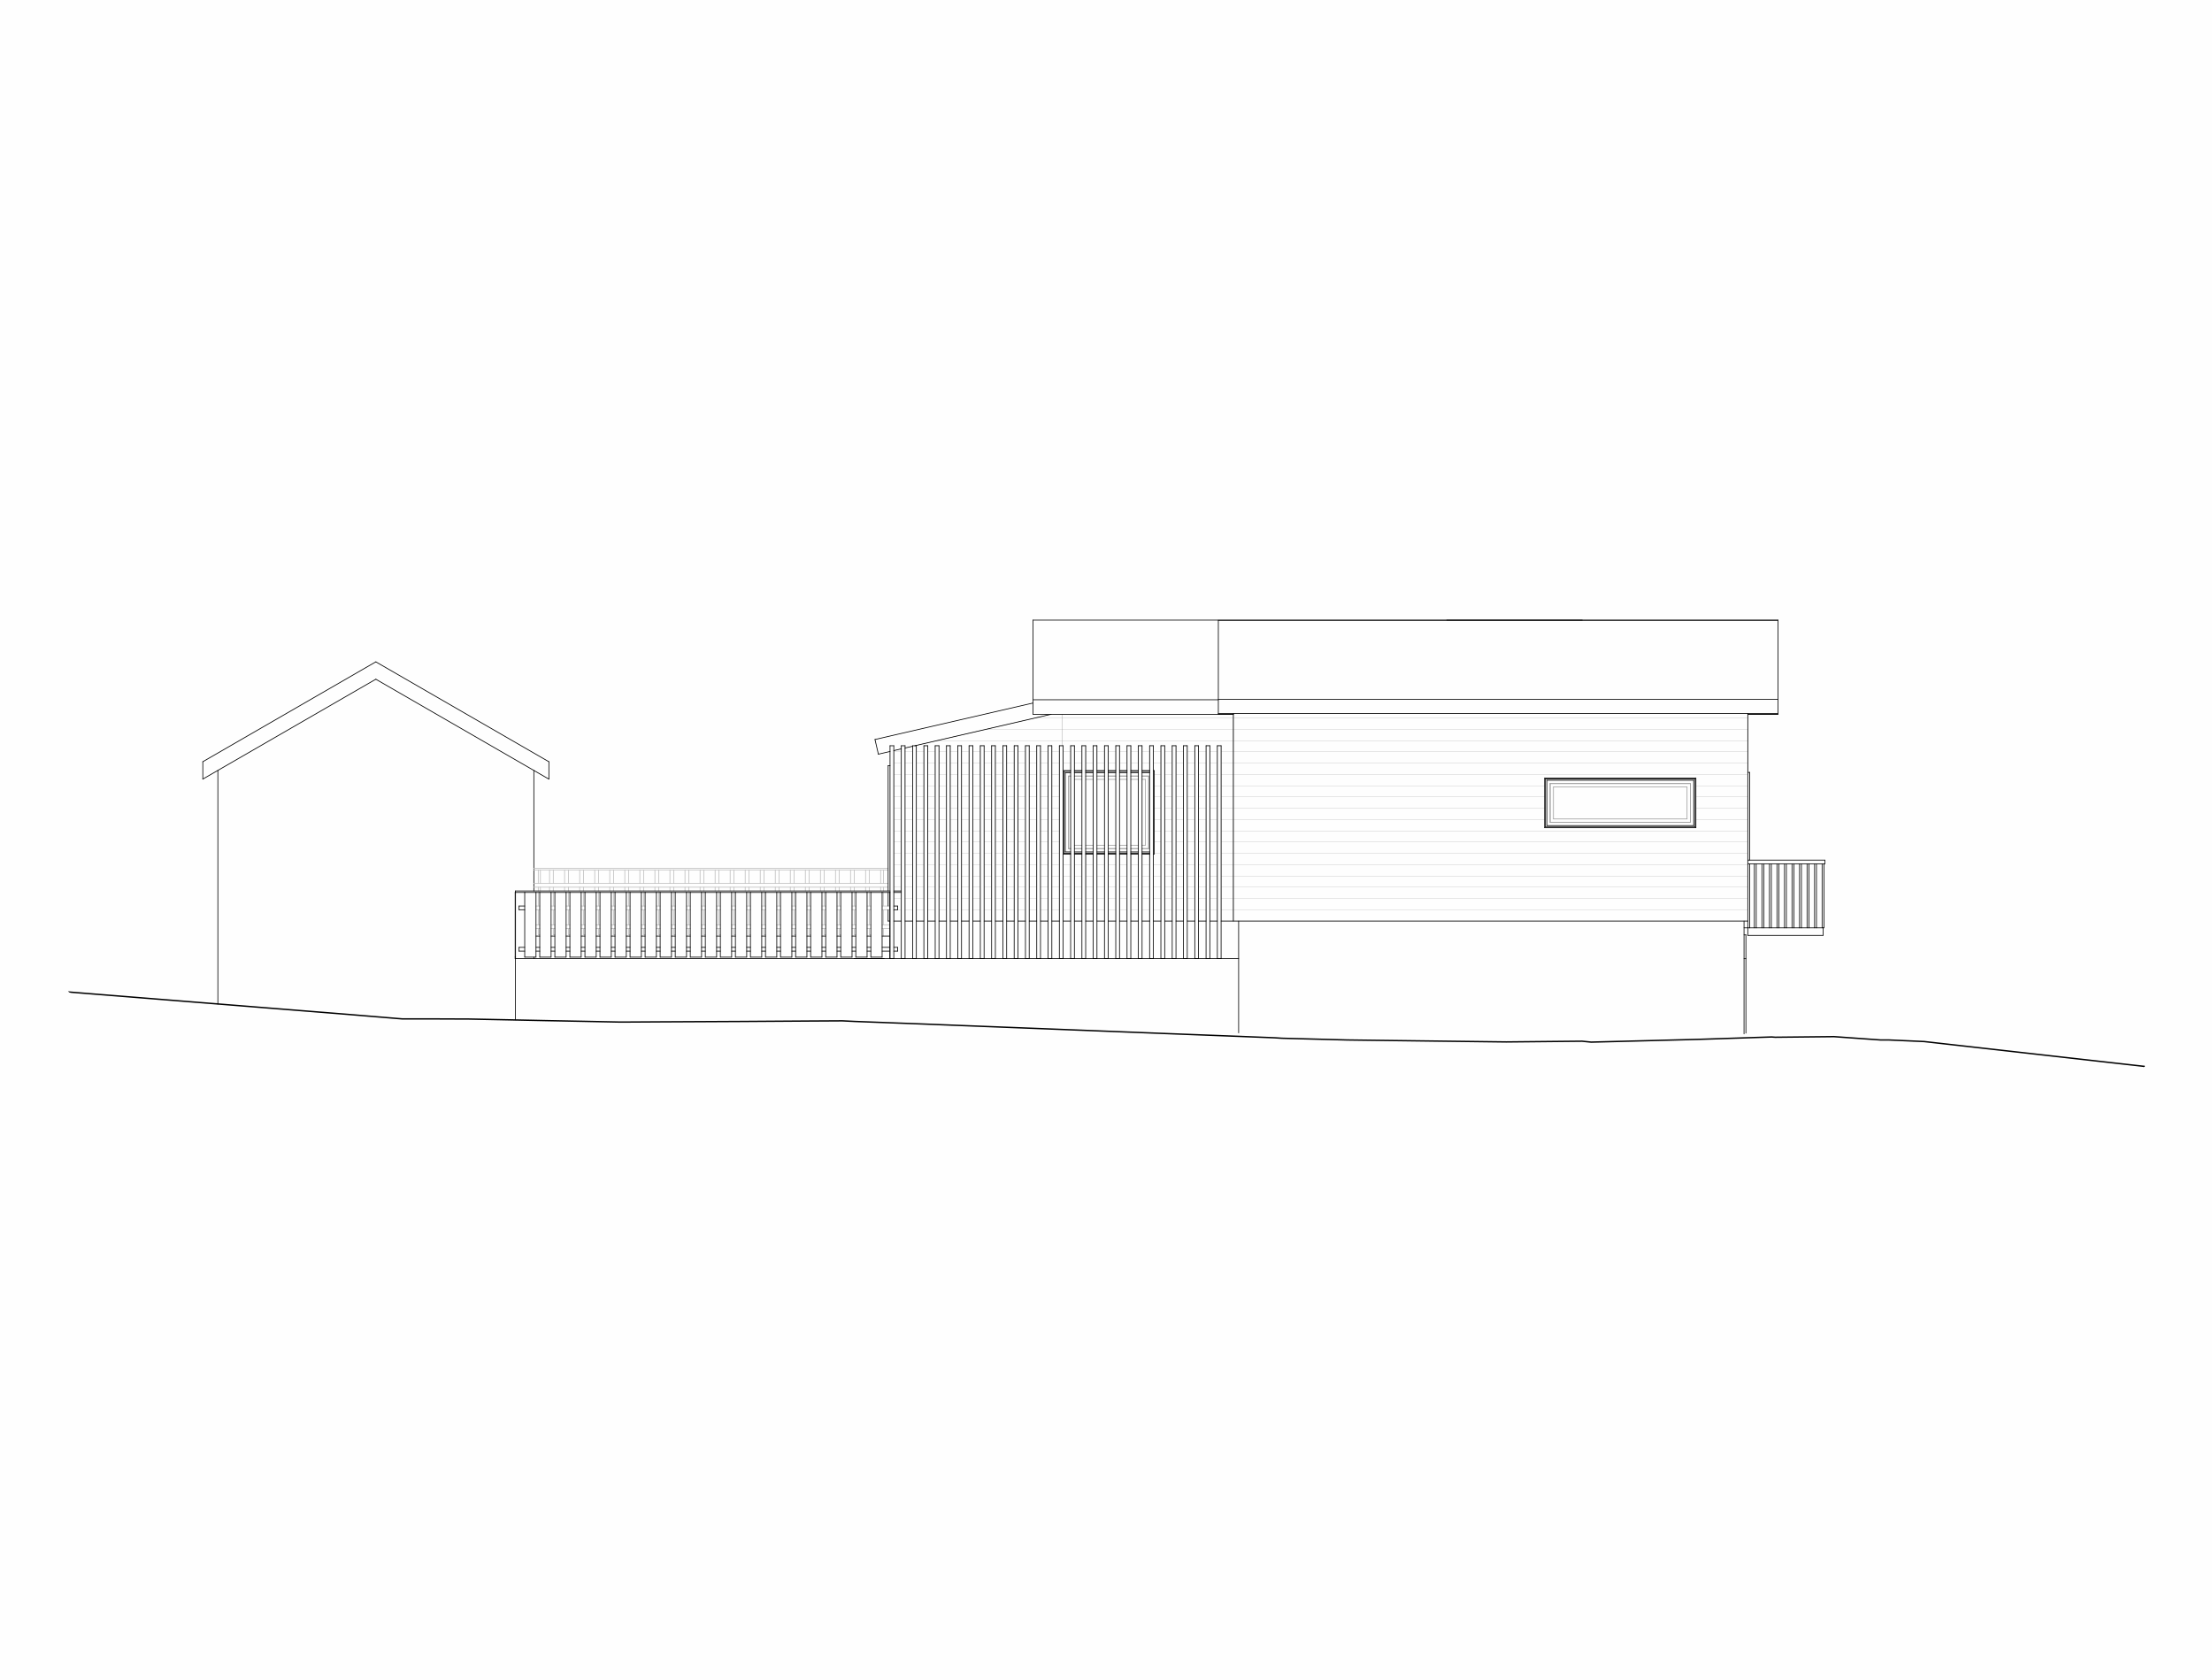 Forunderlig Arkitektur - 1601 - Fasade Sør